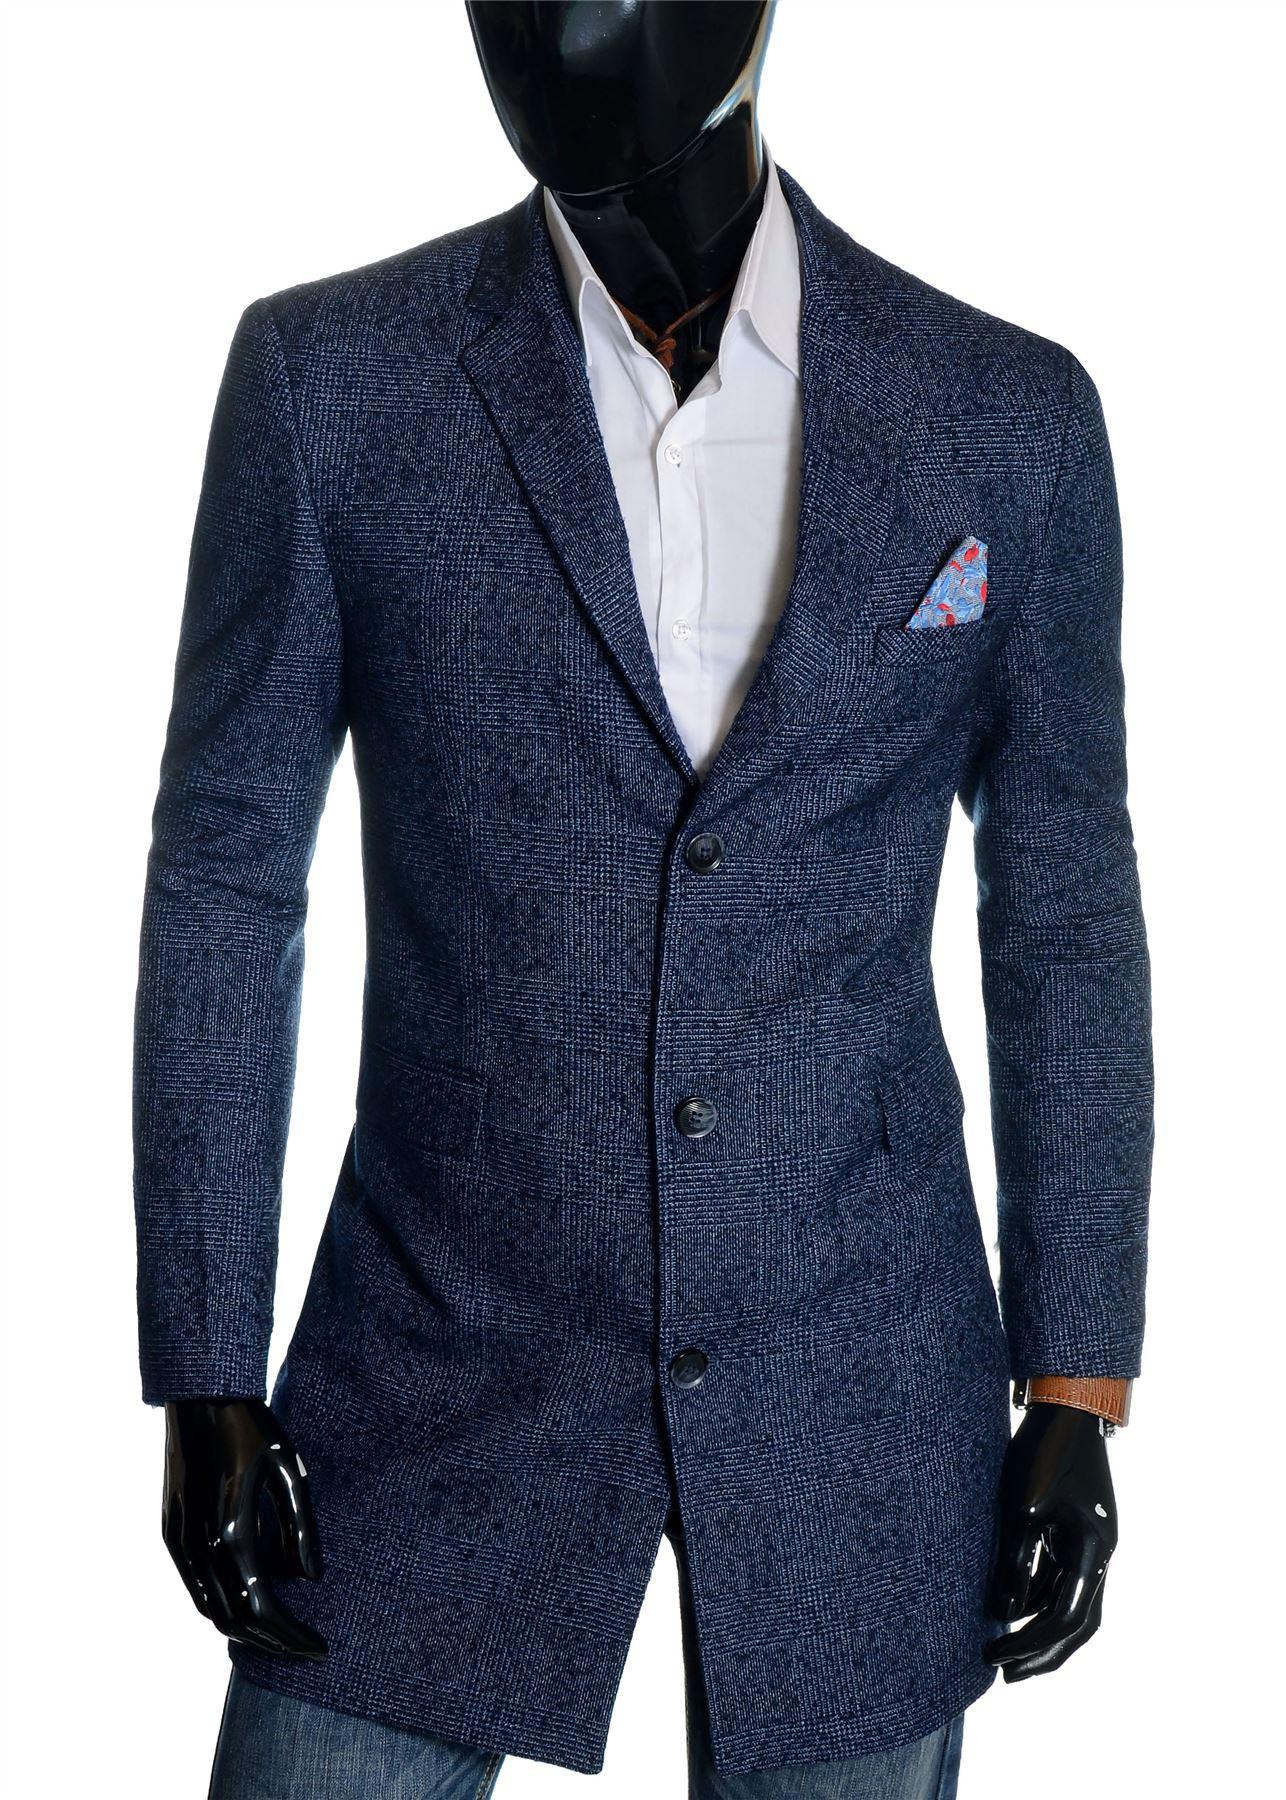 Men-039-s-Checkered-Coat-3-4-Long-Tweed-Cashmere-Wool-Trendy-Formal-Winter-Overcoat thumbnail 8